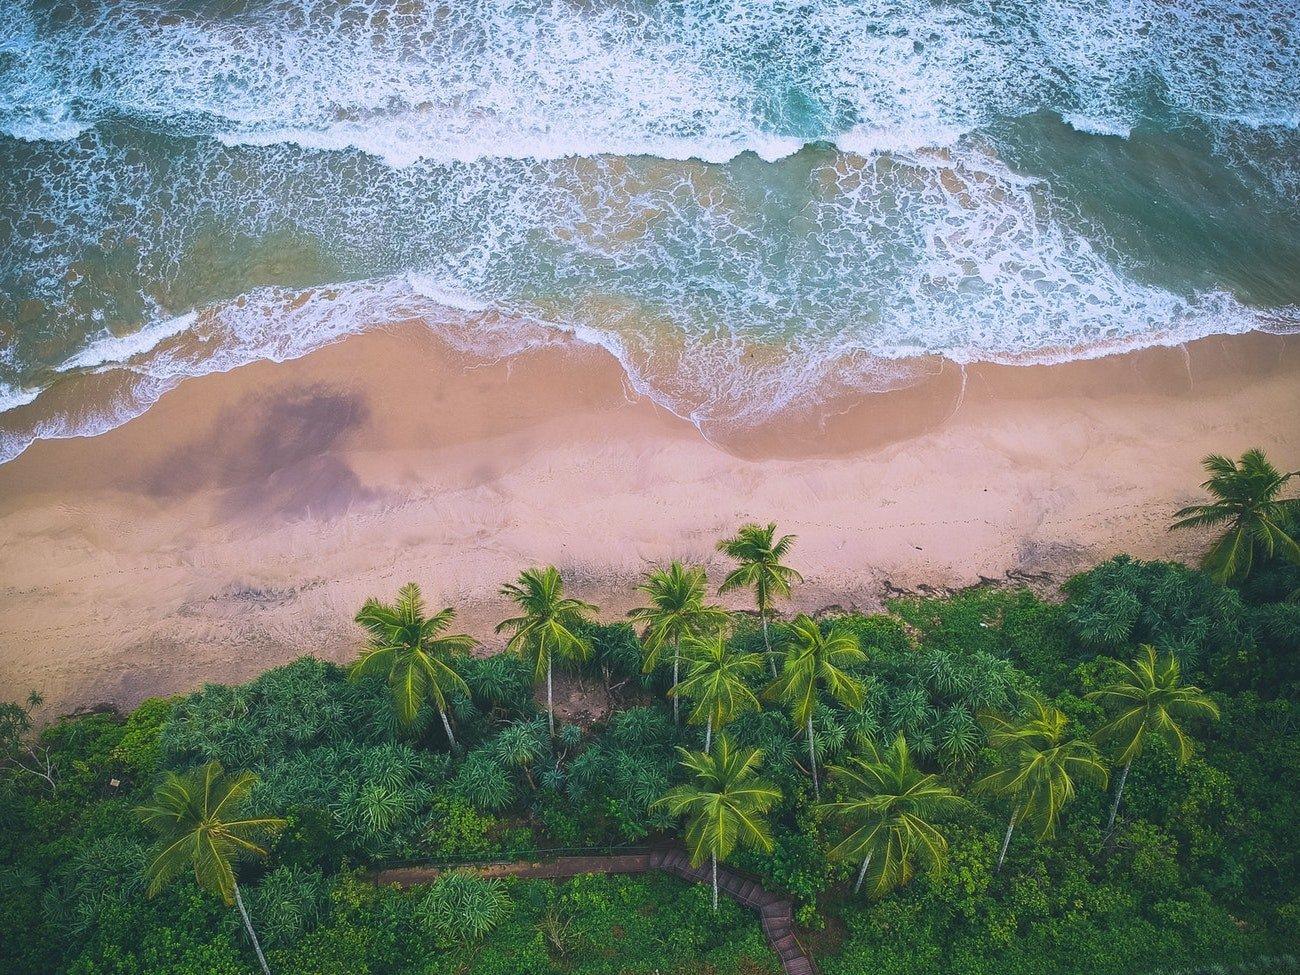 Vacation in Sri Lanka